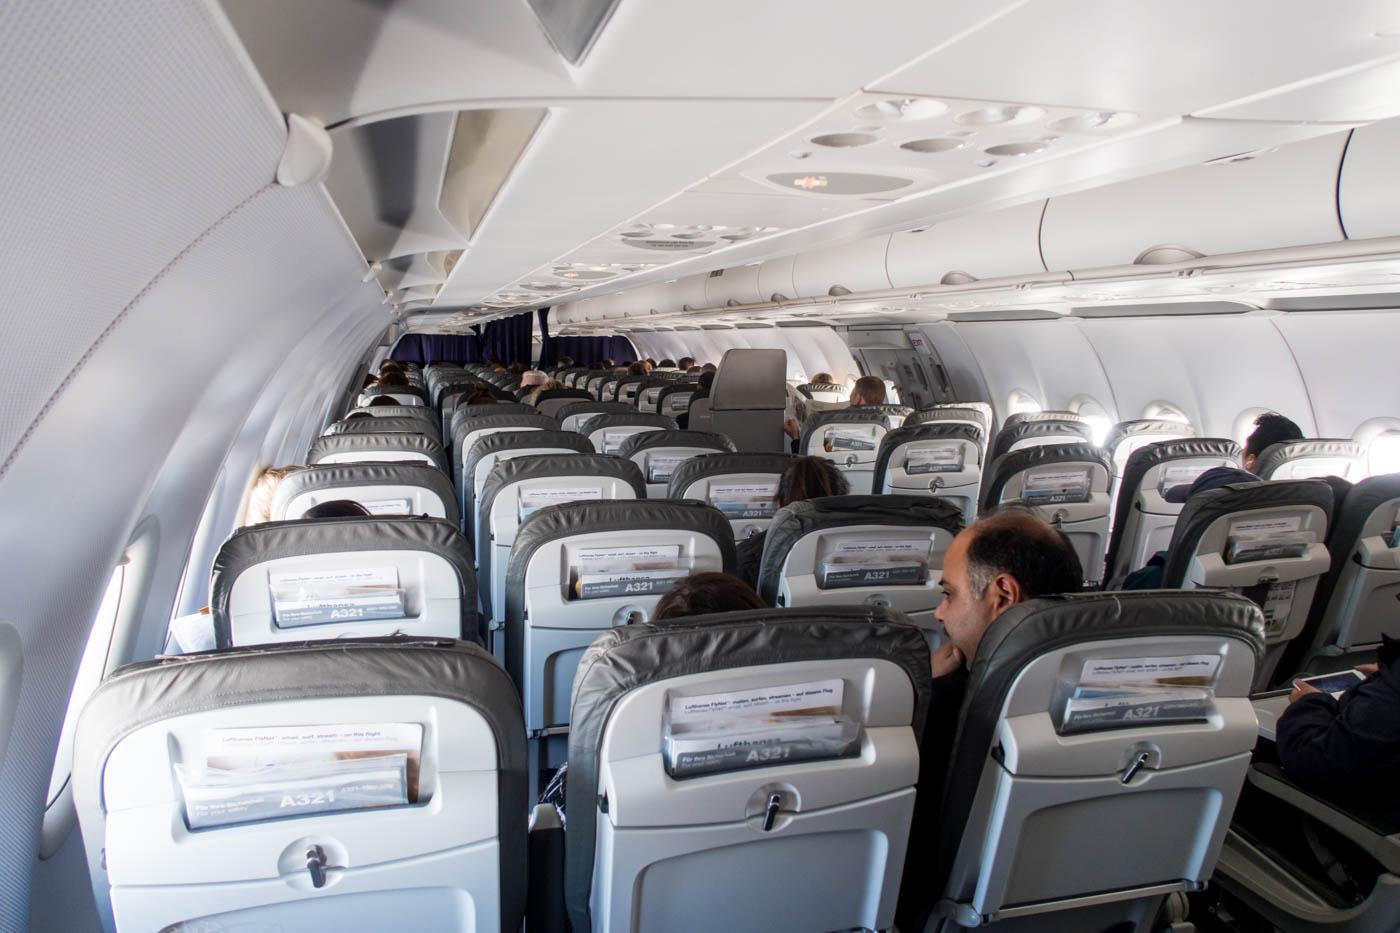 Lufthansa A321 Economy Class Cabin